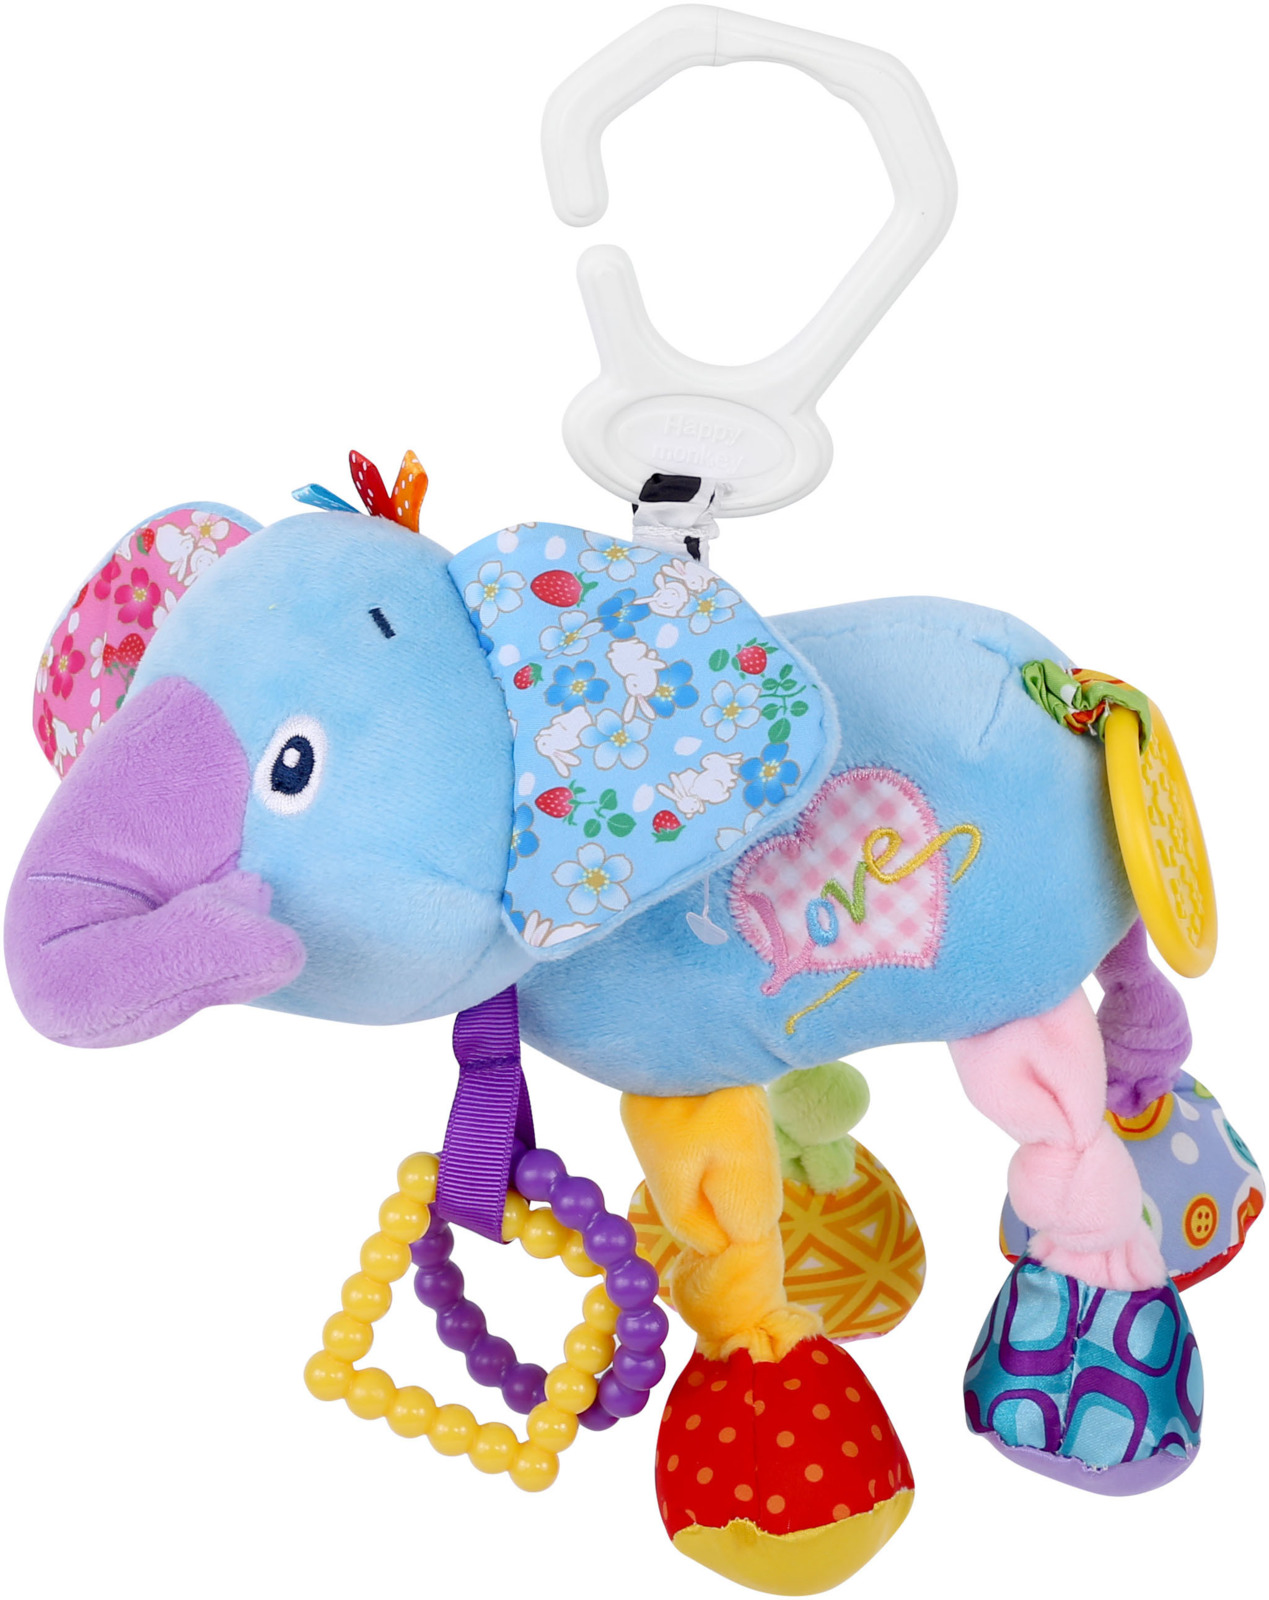 Развивающая игрушка Lorelli Toys Слоник. 1019117 развивающая игрушка lorelli toys обними меня мартышка 10191260001